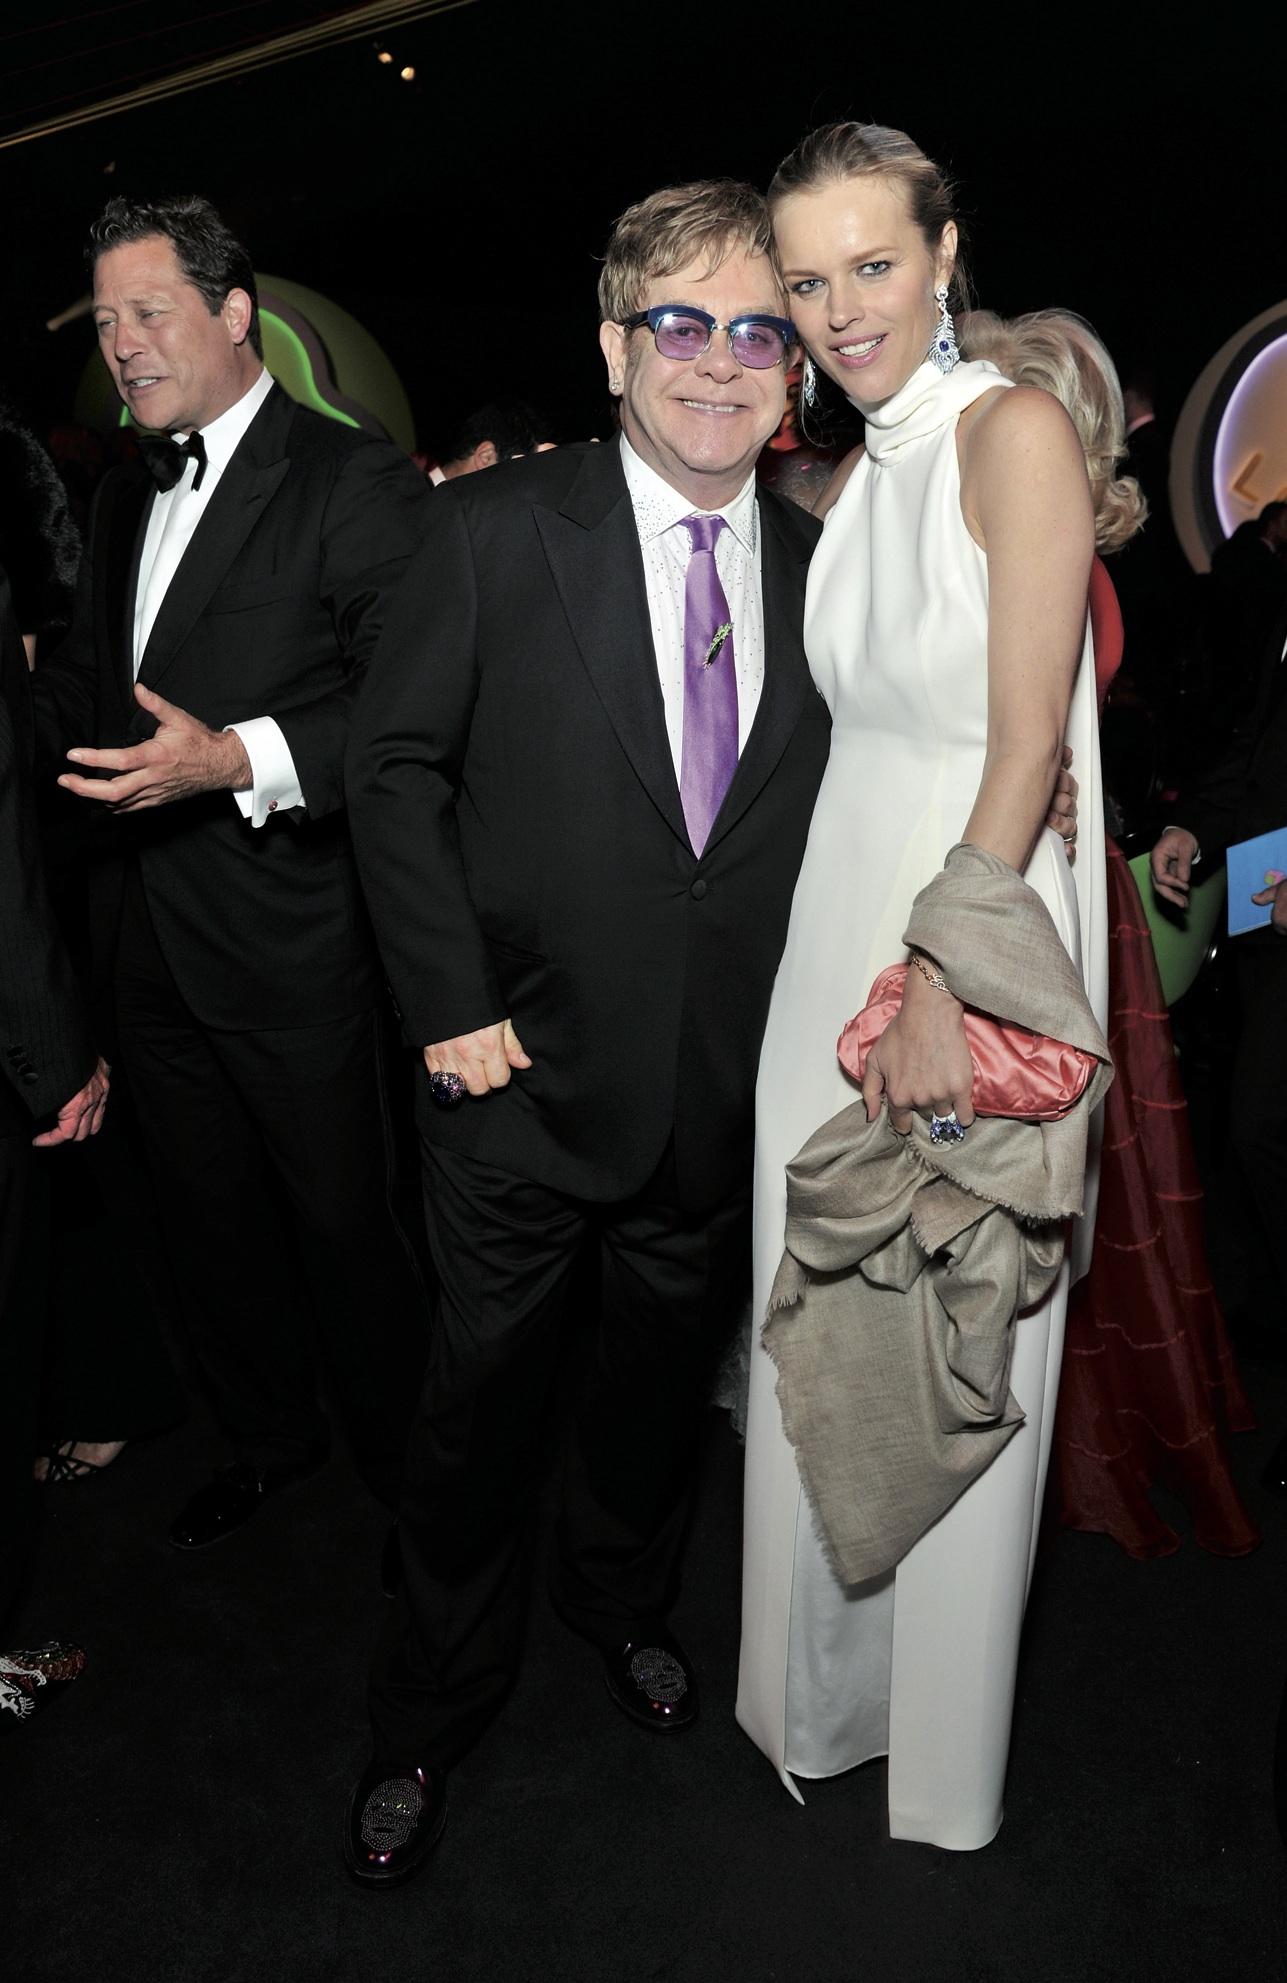 Sir Elton John and Eva Herzigova in Chopard.